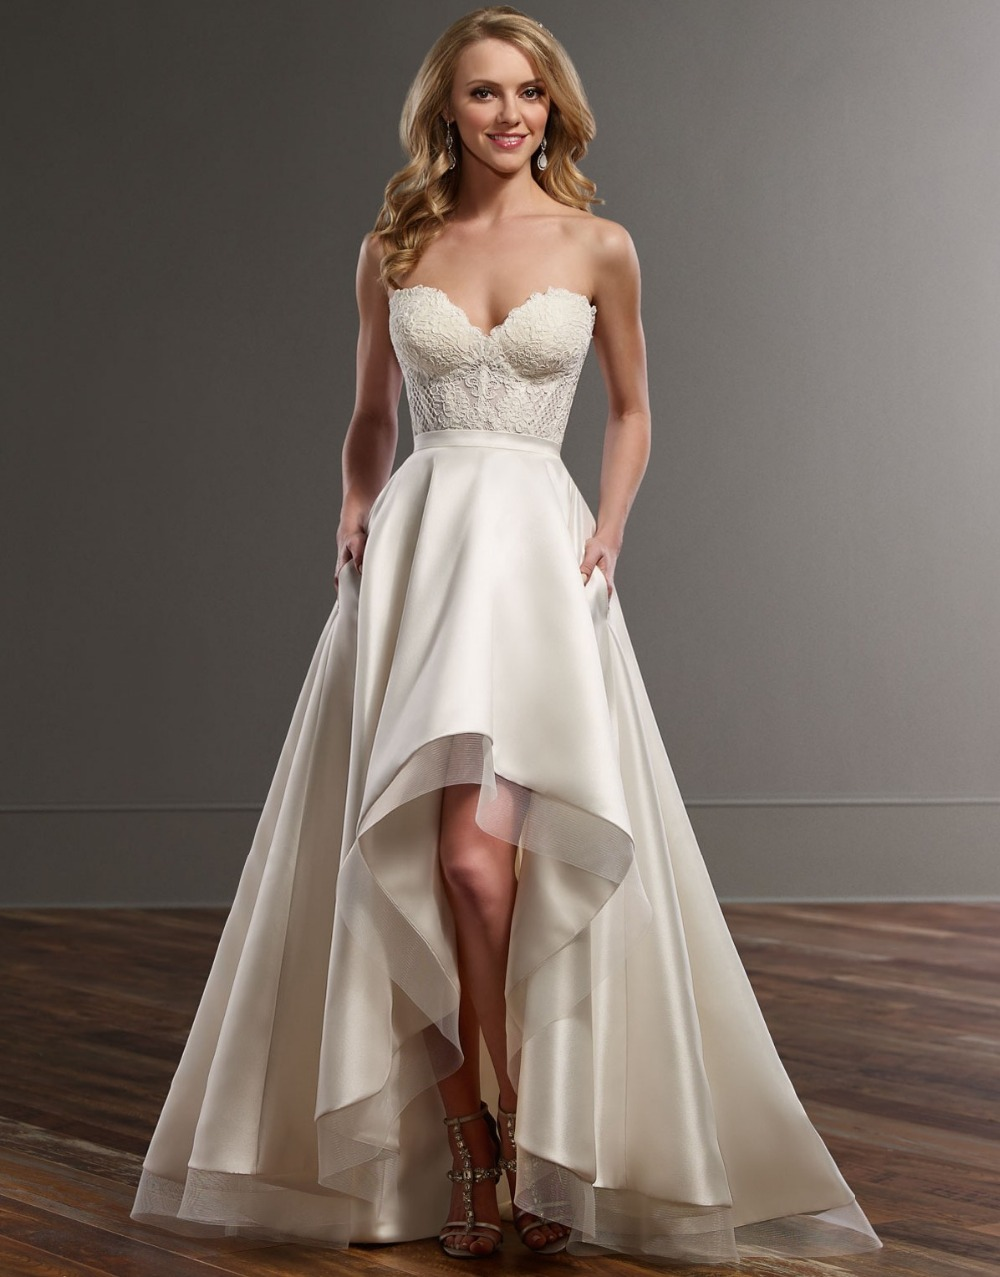 Wedding Dress 2017 Vestido De Noiva Sweetheart Lace Satin Short Front Long Back Y Gowns Bride Boho In Dresses From Weddings Events On